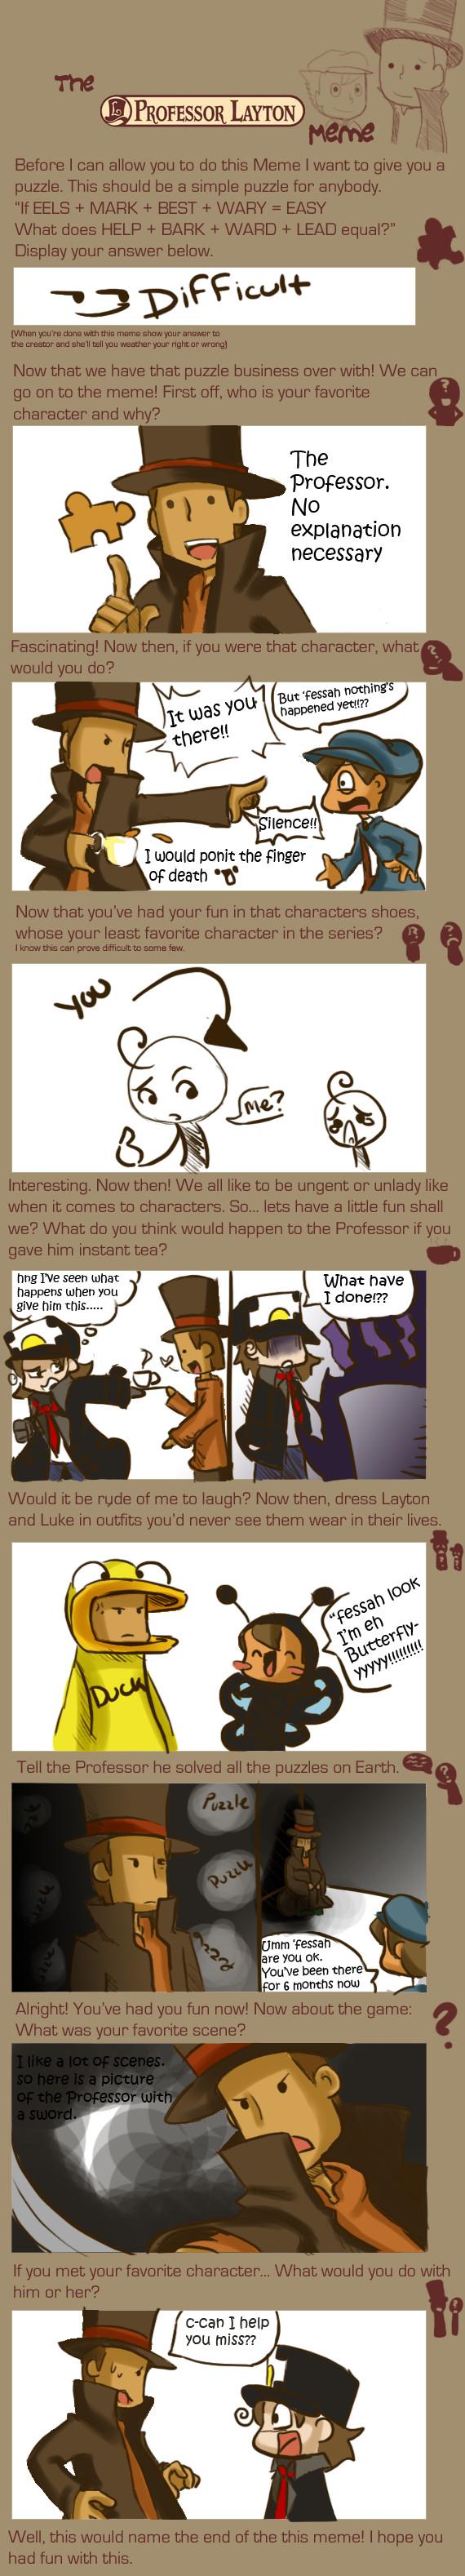 Professor Layton Meme by megamooni